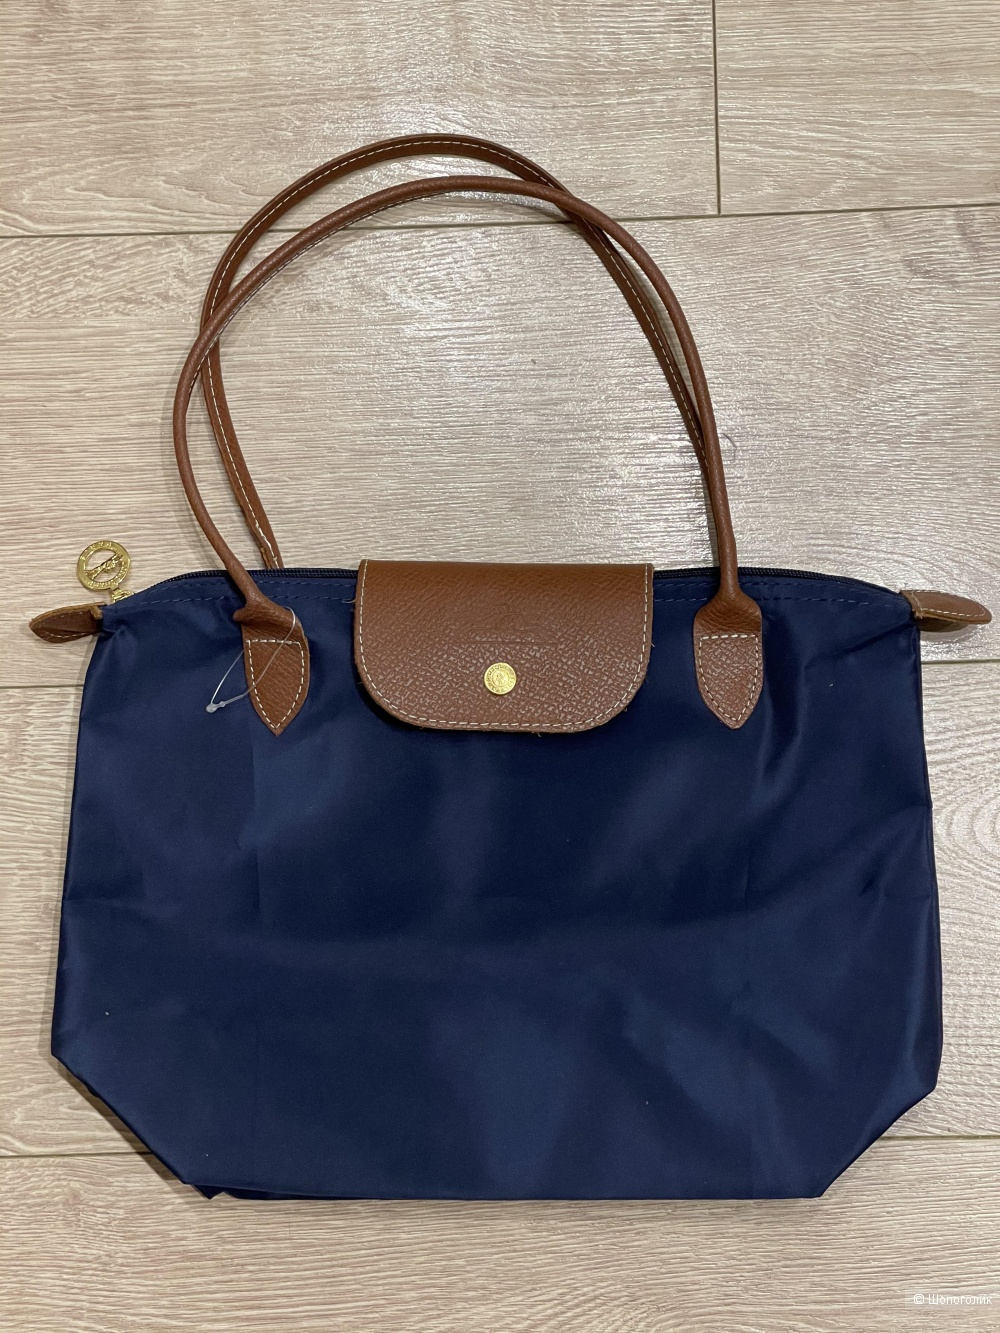 Сумка Longchamp размер 25 на 35 см